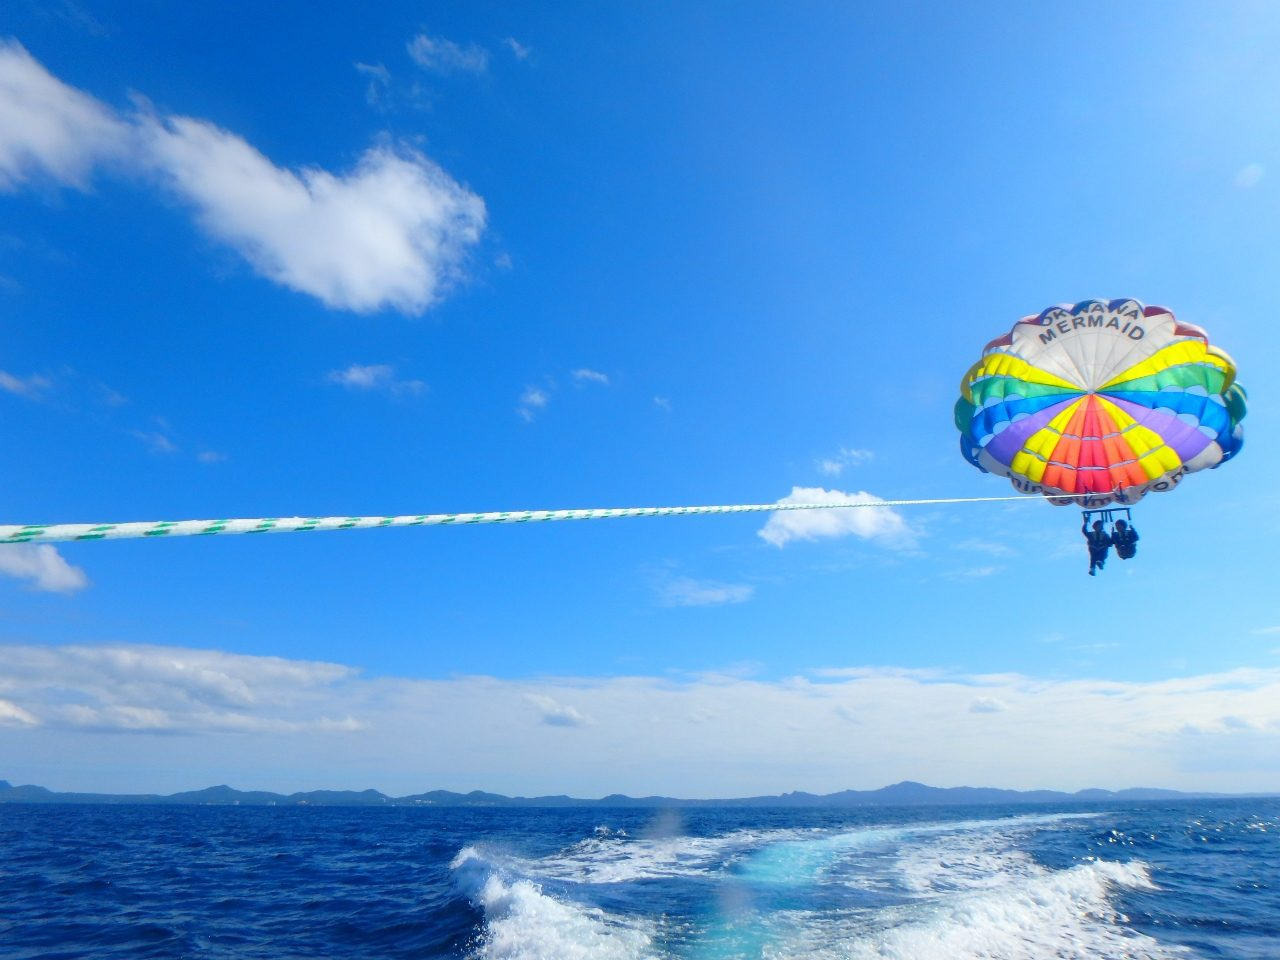 okinawaの海は今日もキレイです【沖縄マリンスポーツ専門店★水納島マーメイド】